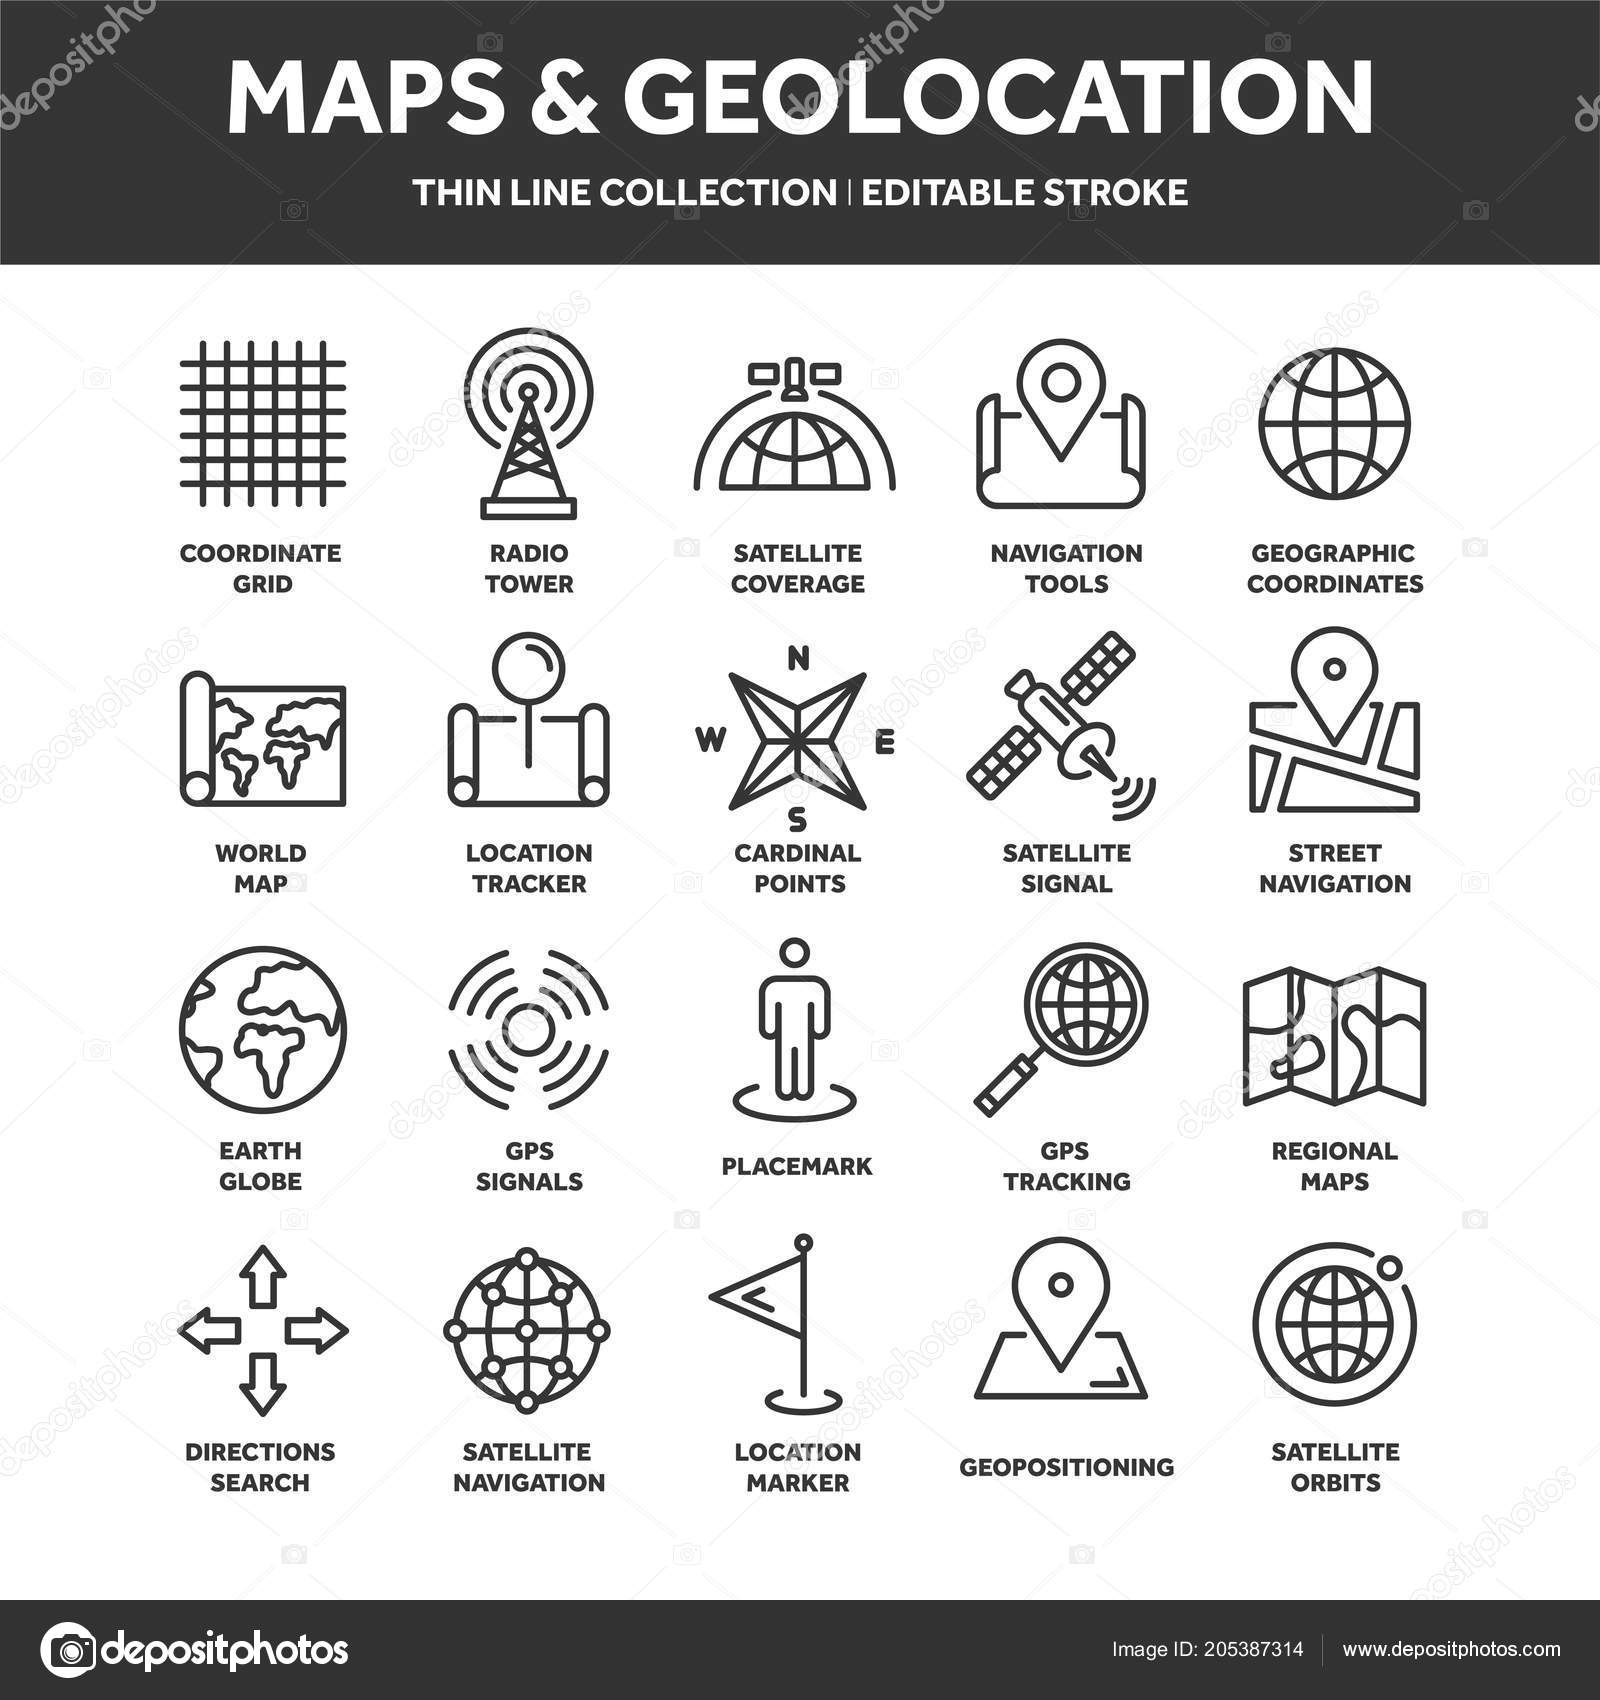 Koordinaten Karte.Karte Und Navigation Gps Koordinaten Lage Symbole